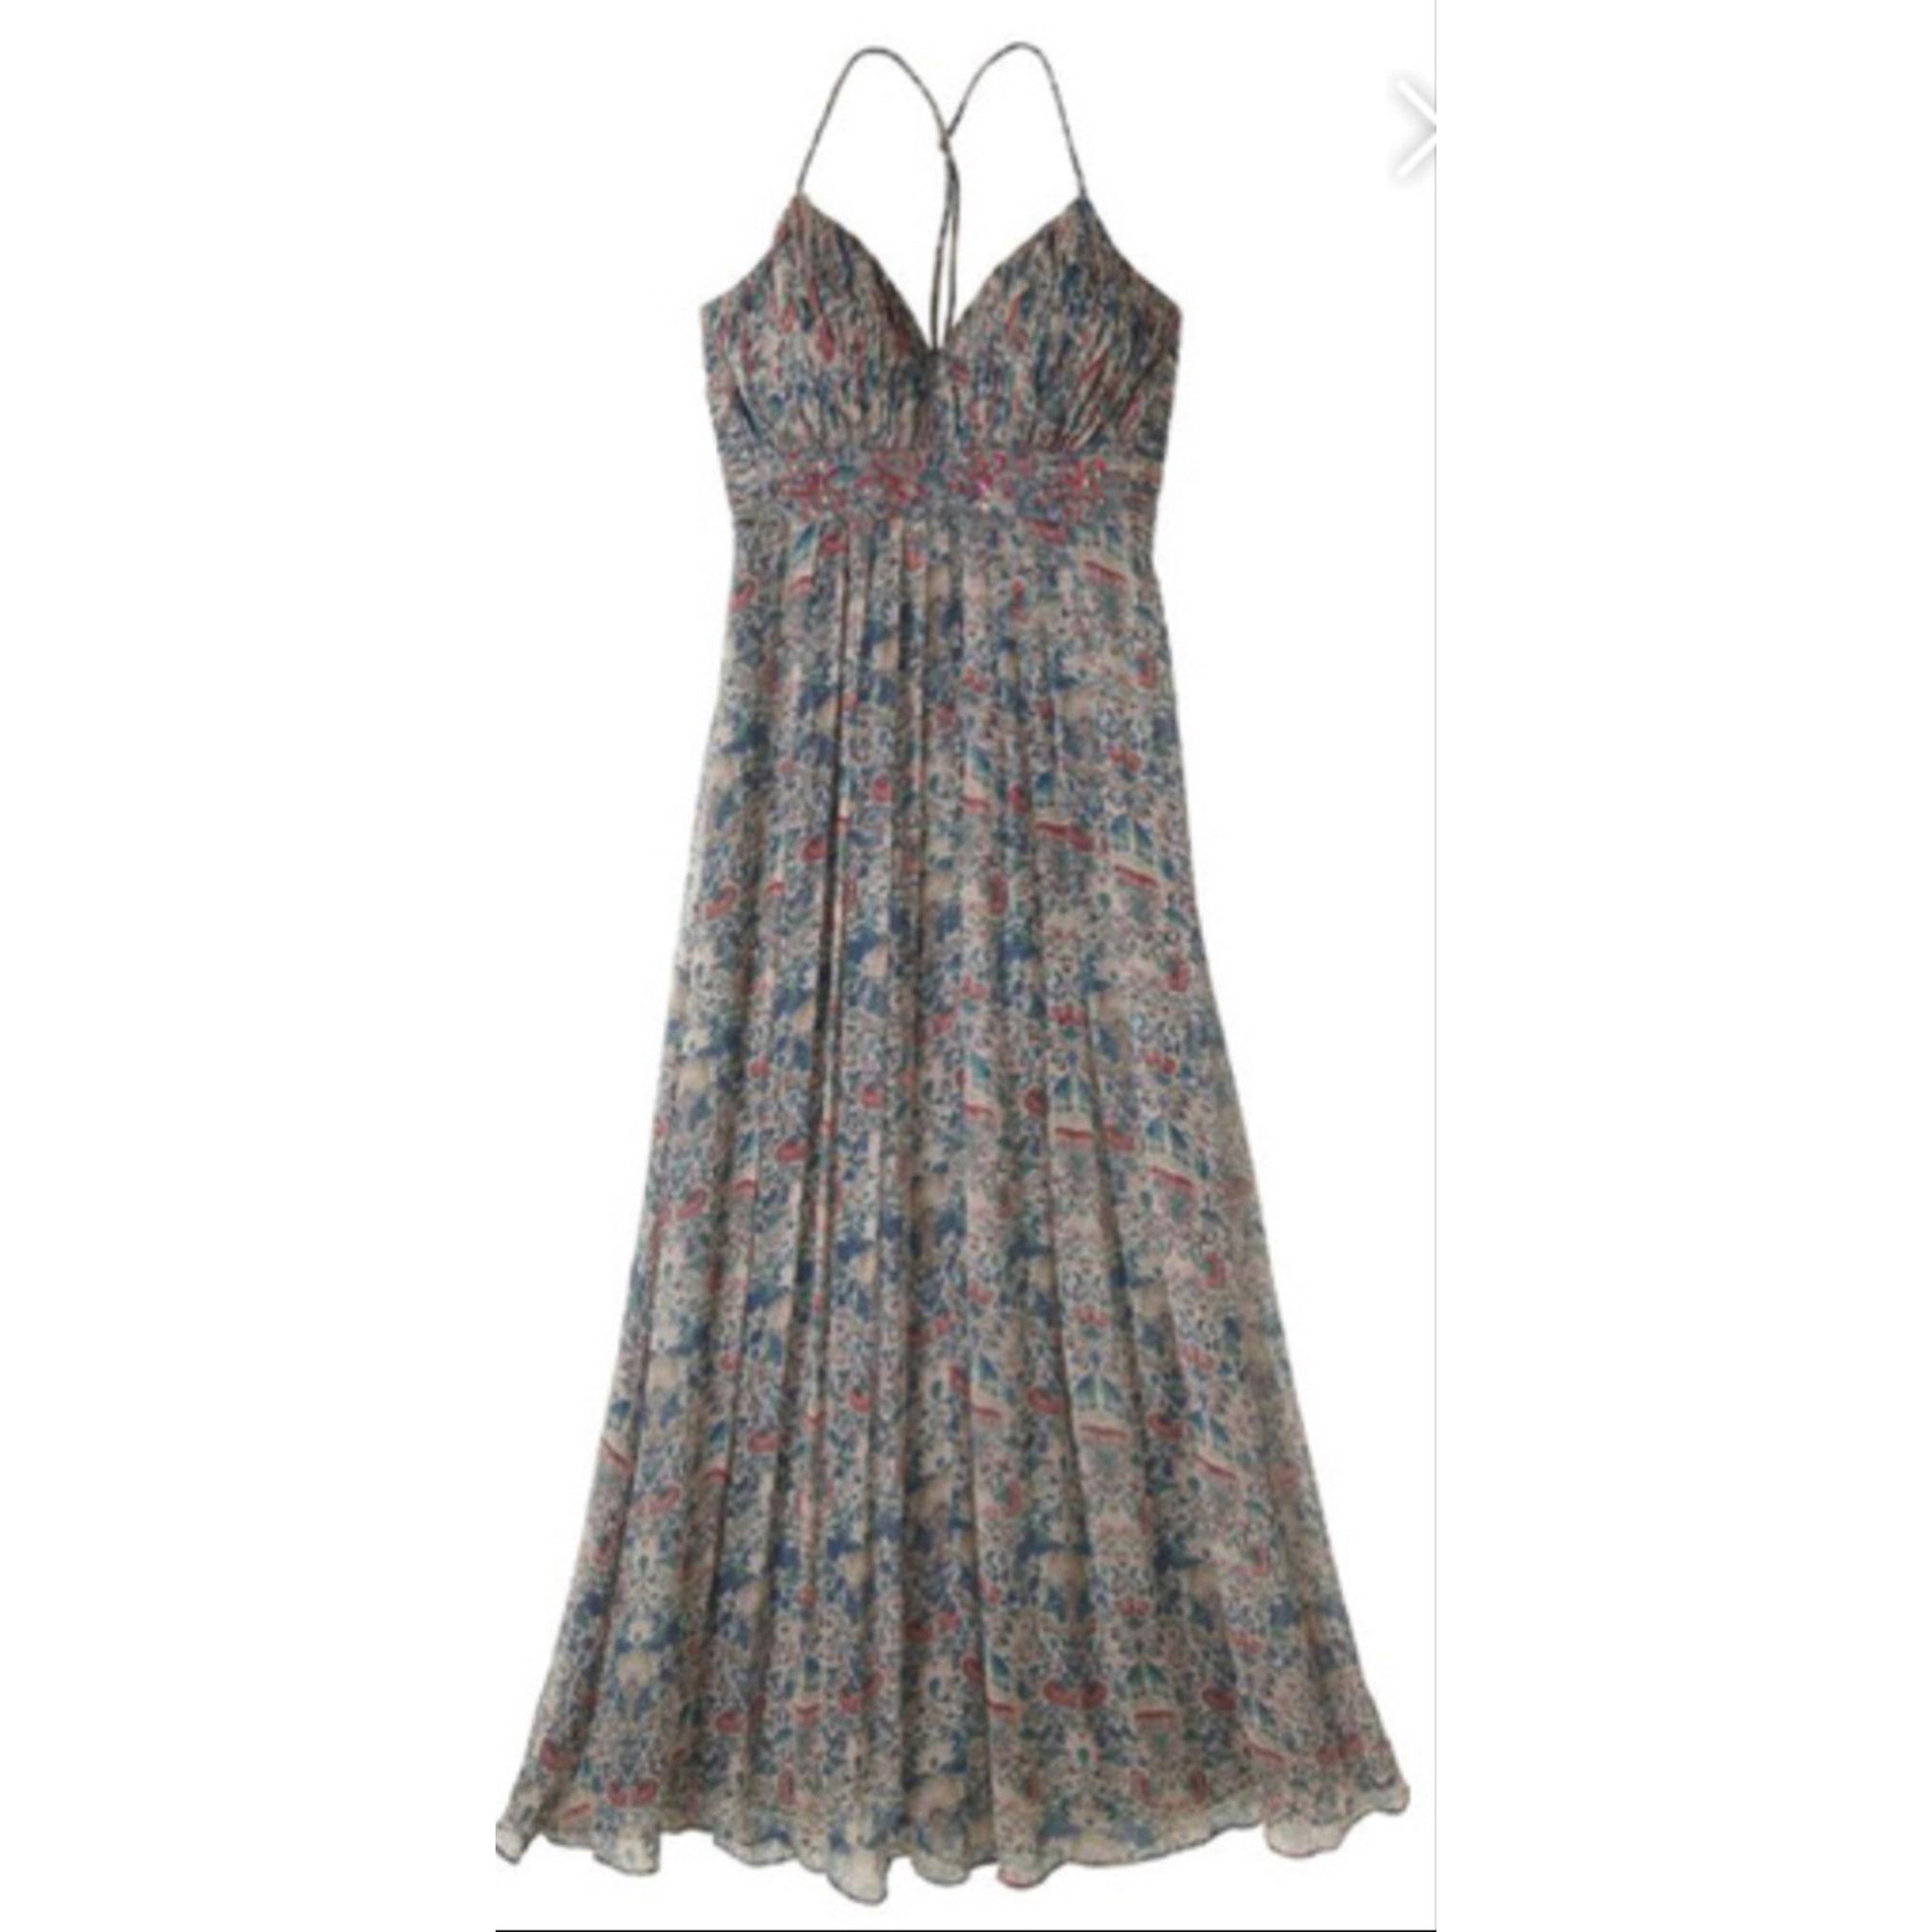 Robe Longue Caroll 40 L T3 Multicouleur 8214657